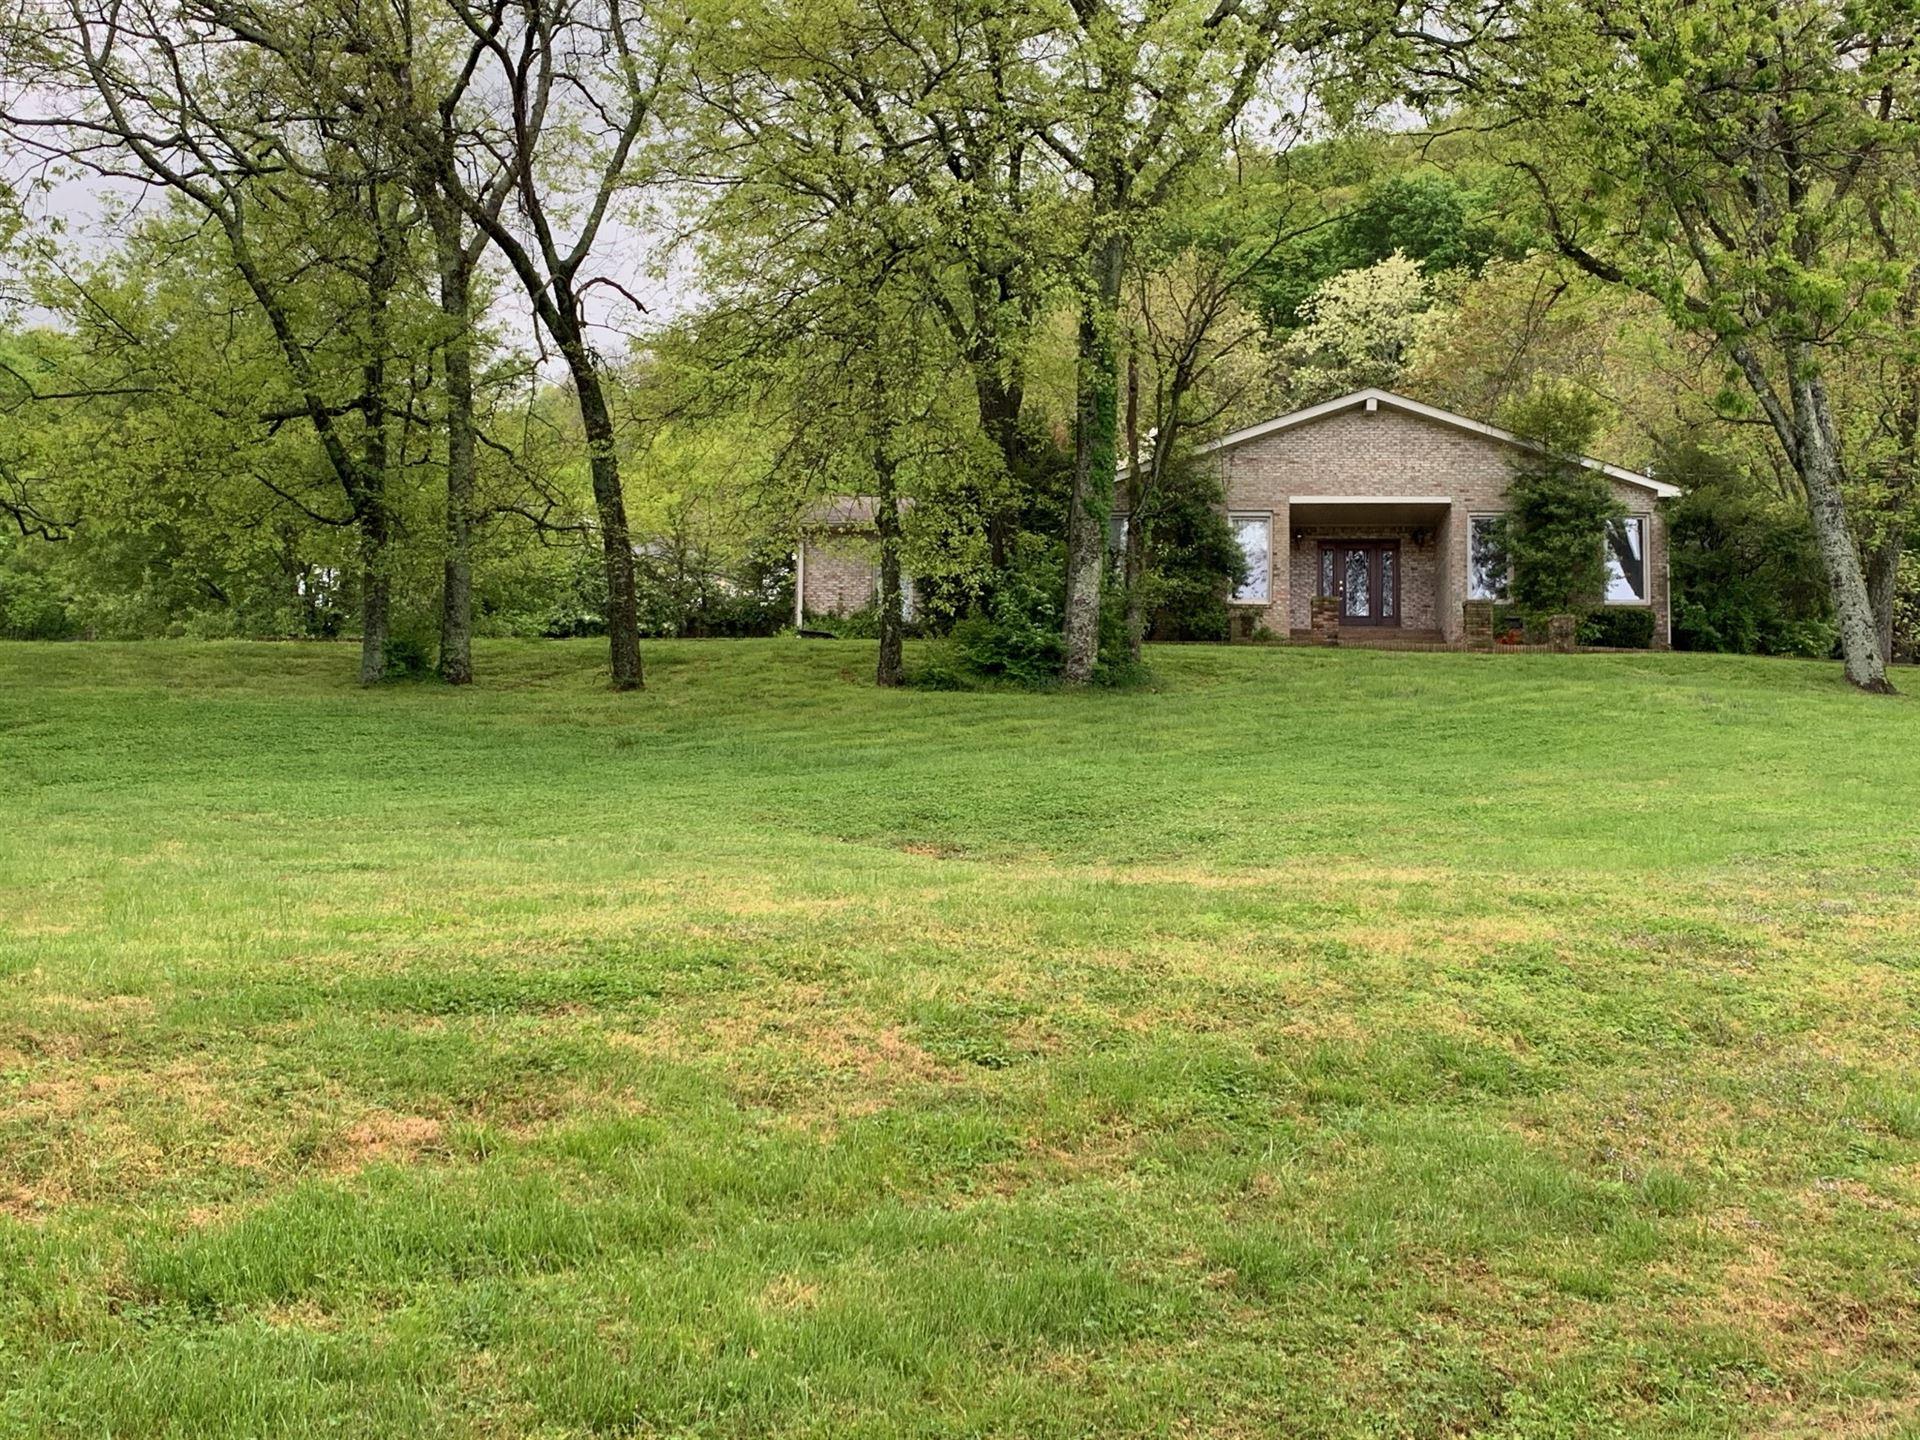 Photo of 102 Windsor Way, Franklin, TN 37069 (MLS # 2248023)